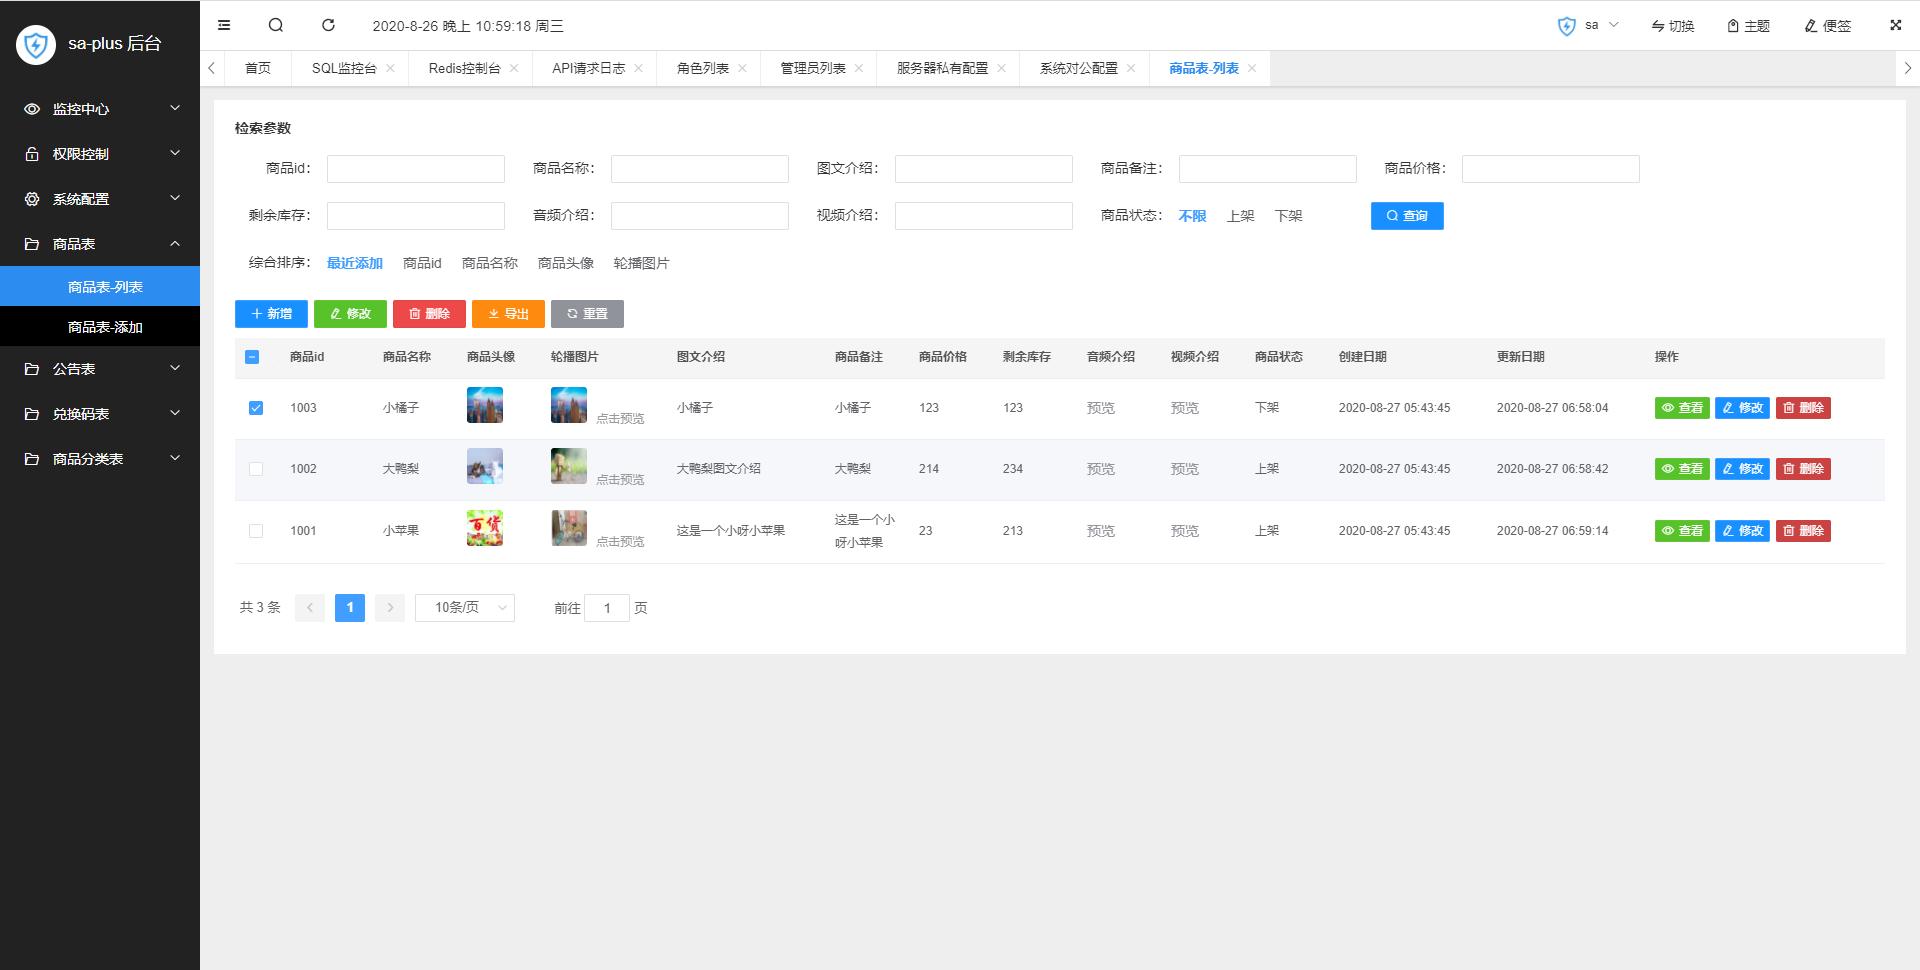 sa-plus v1.25.0 更新,基于 SpringBoot 的快速开发框架